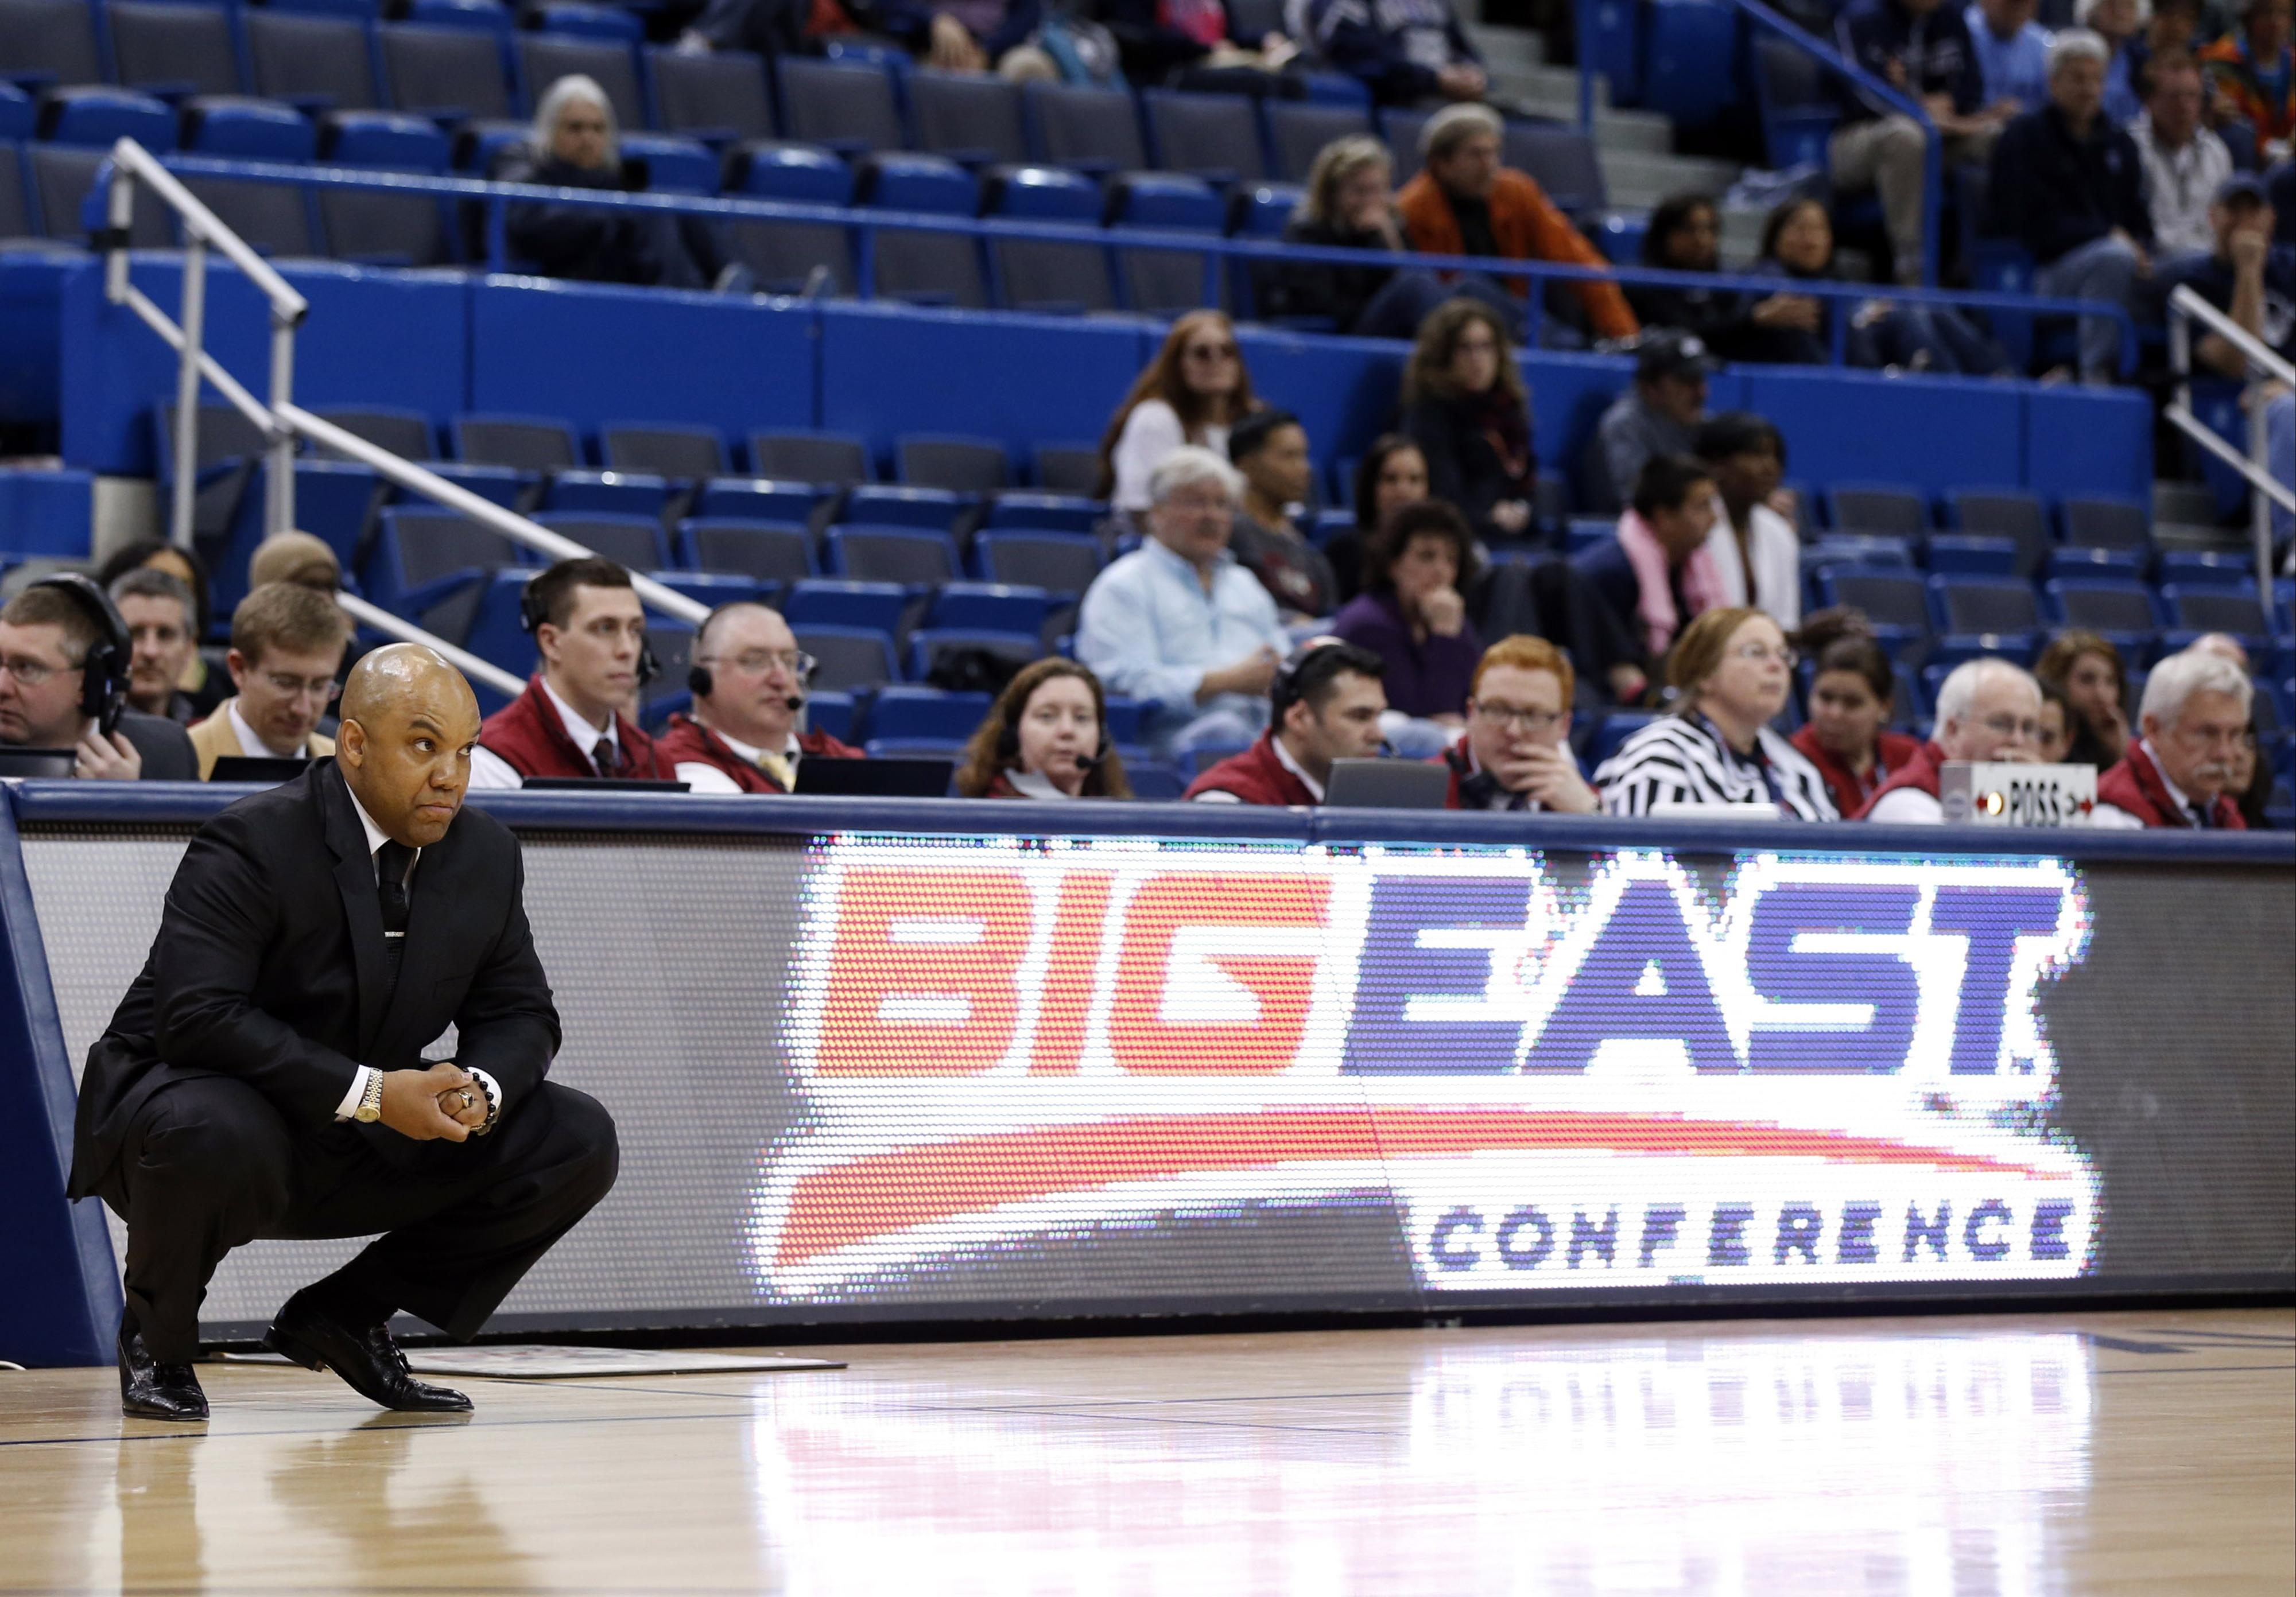 Report: Big East hires Ackerman as new commissioner